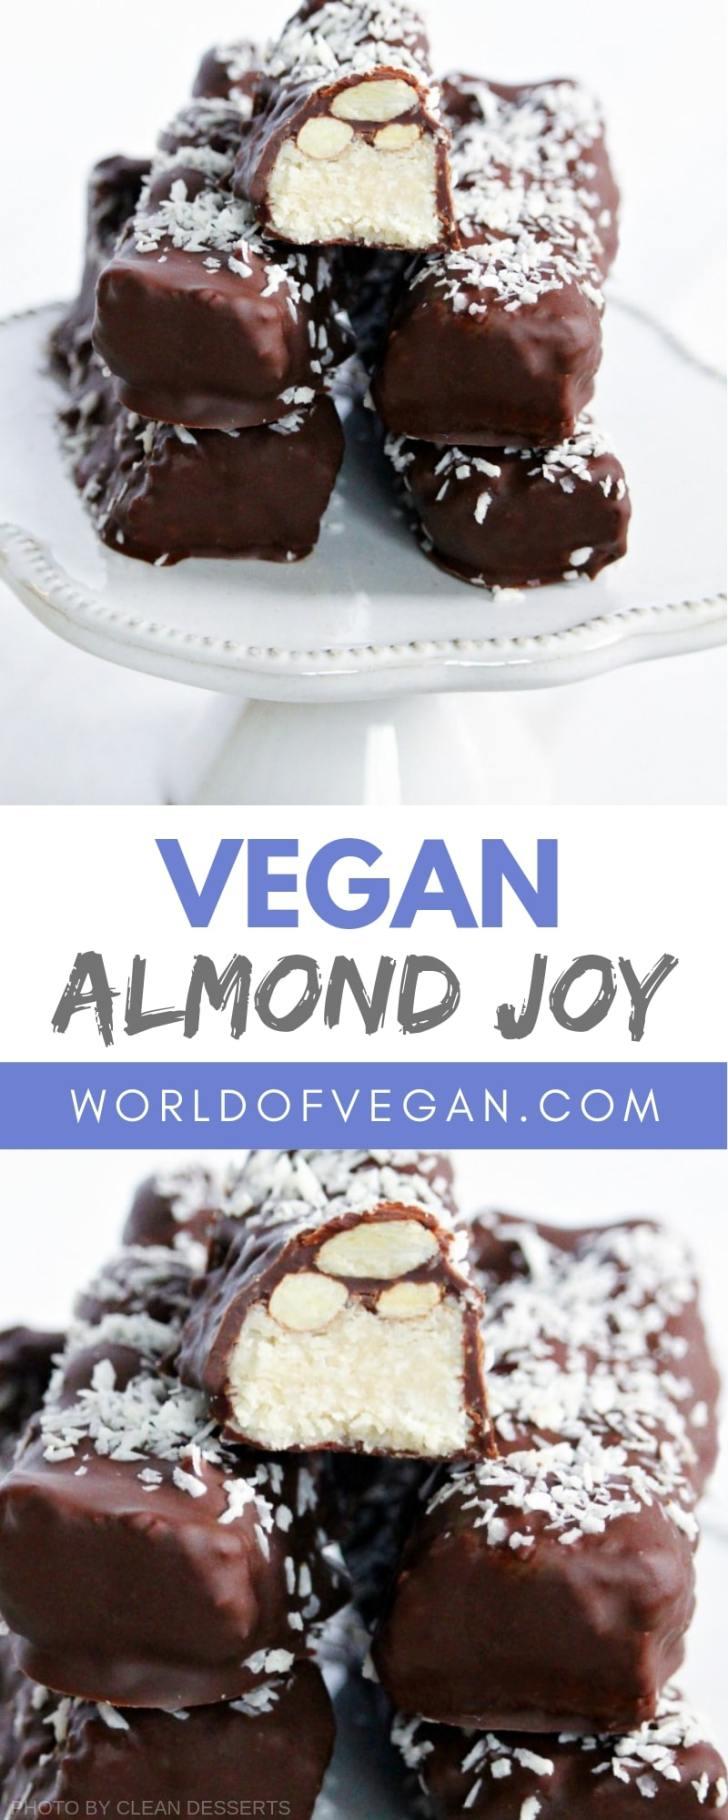 Vegan Almond Joy Bars Recipe | Vegan Dessert | World of Vegan | #almond #dessert #candy #bar #coconut #almonjoy #vegan #worldofvegan